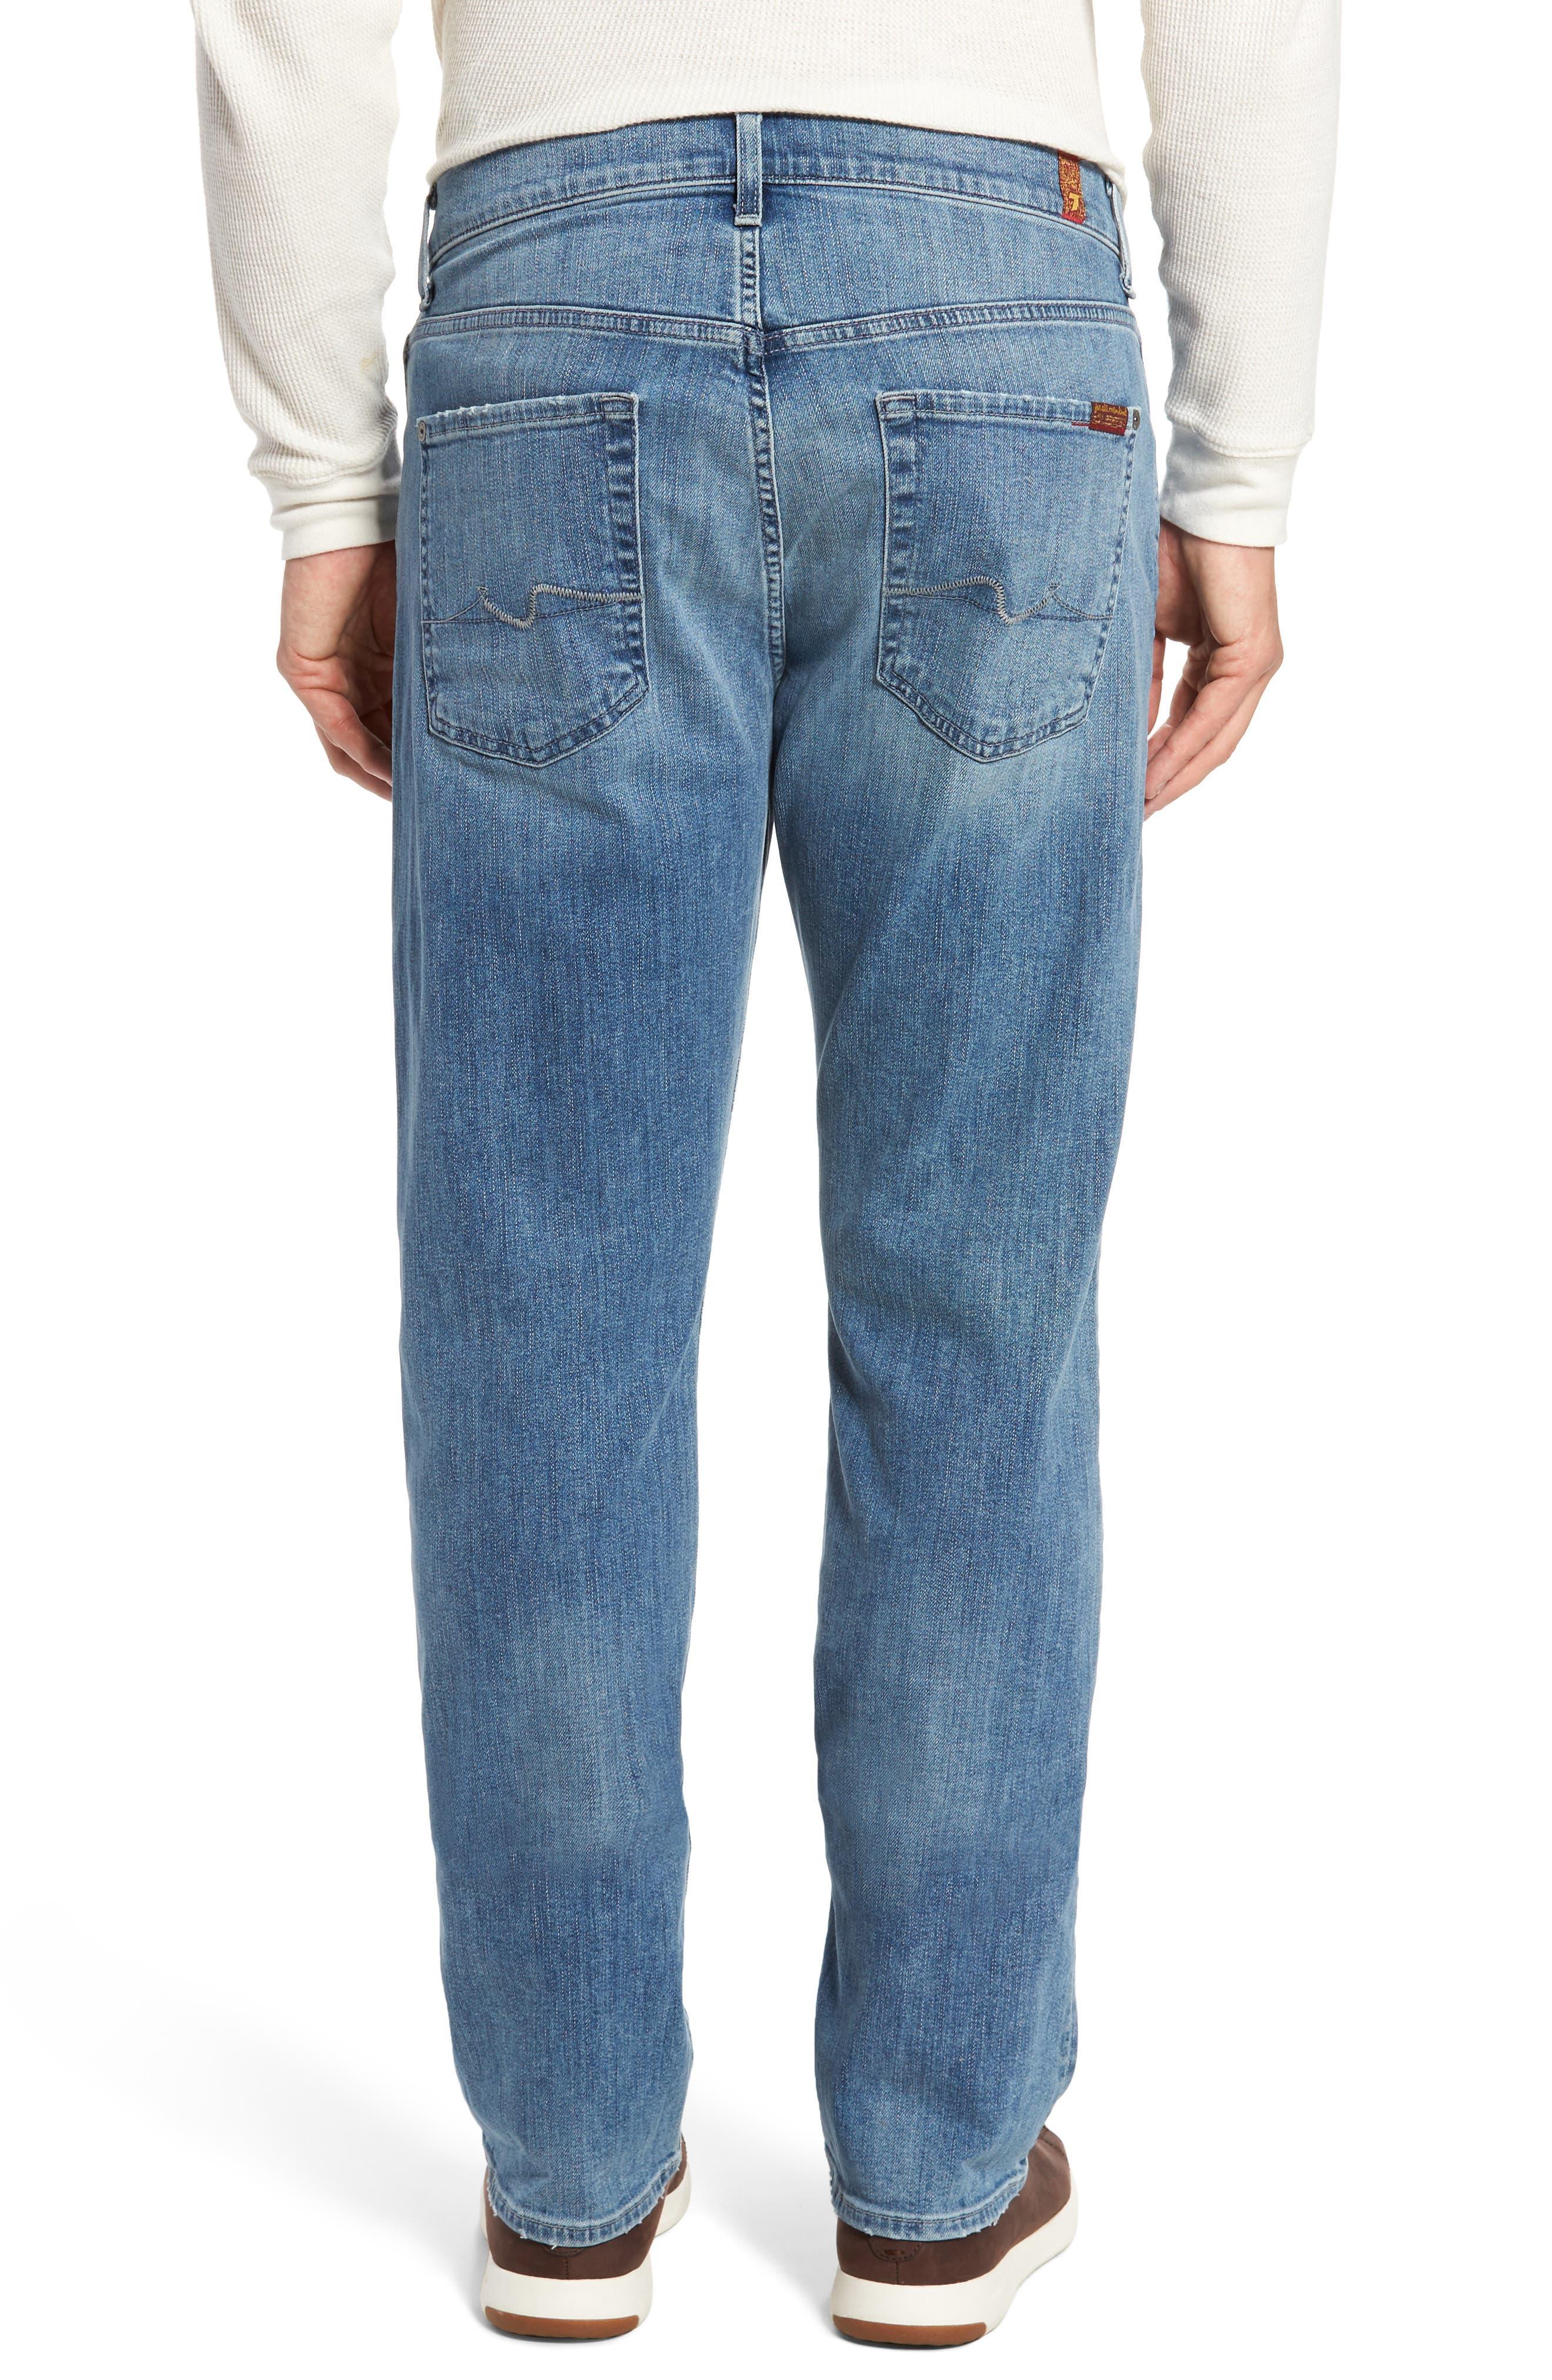 Luxe Performance - Carsen Straight Leg Jeans,                             Alternate thumbnail 2, color,                             Homage